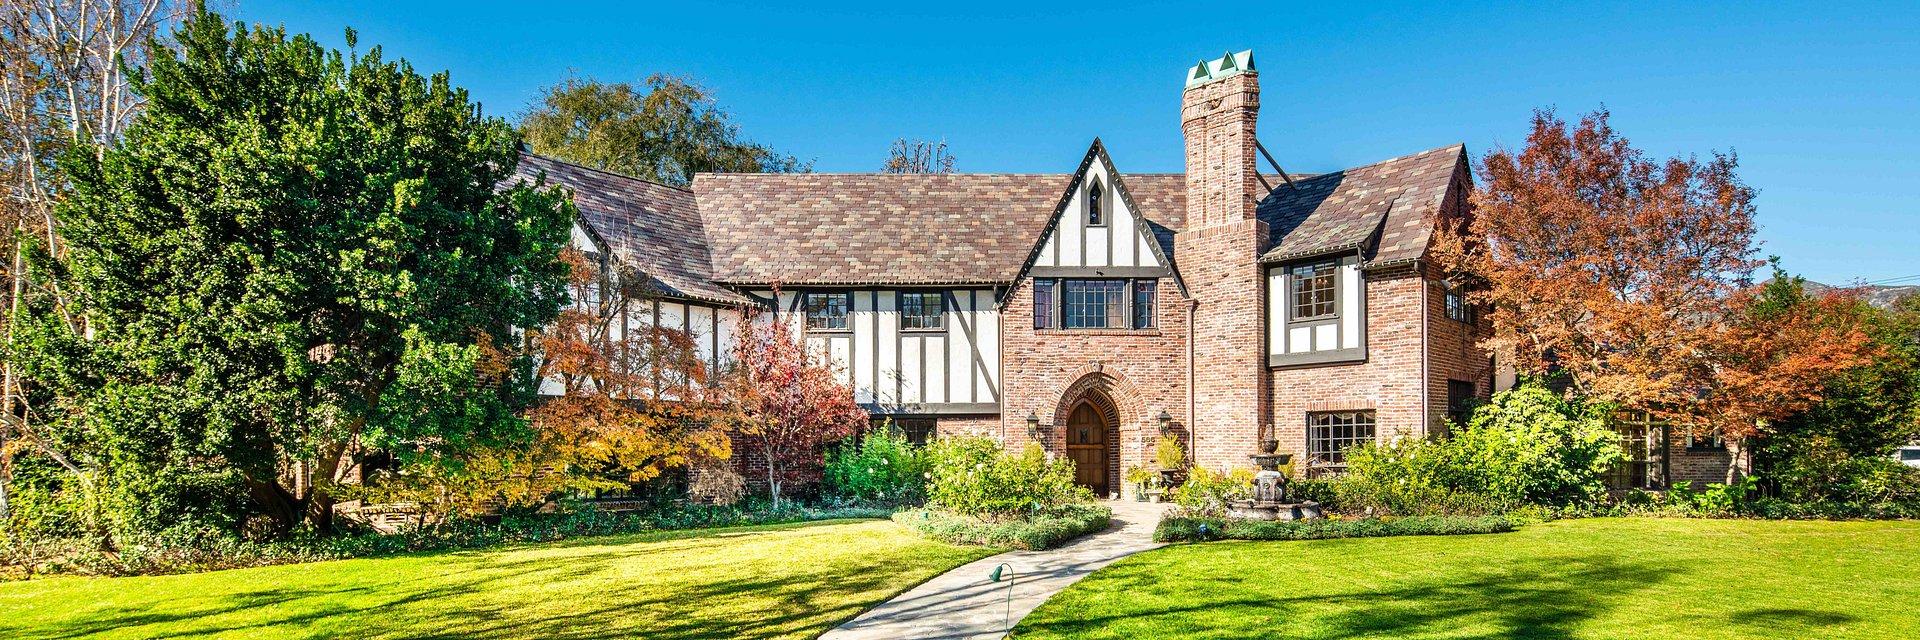 Coldwell Banker Residential Brokerage Lists La Cañada Flintridge Property for $7.5 Million